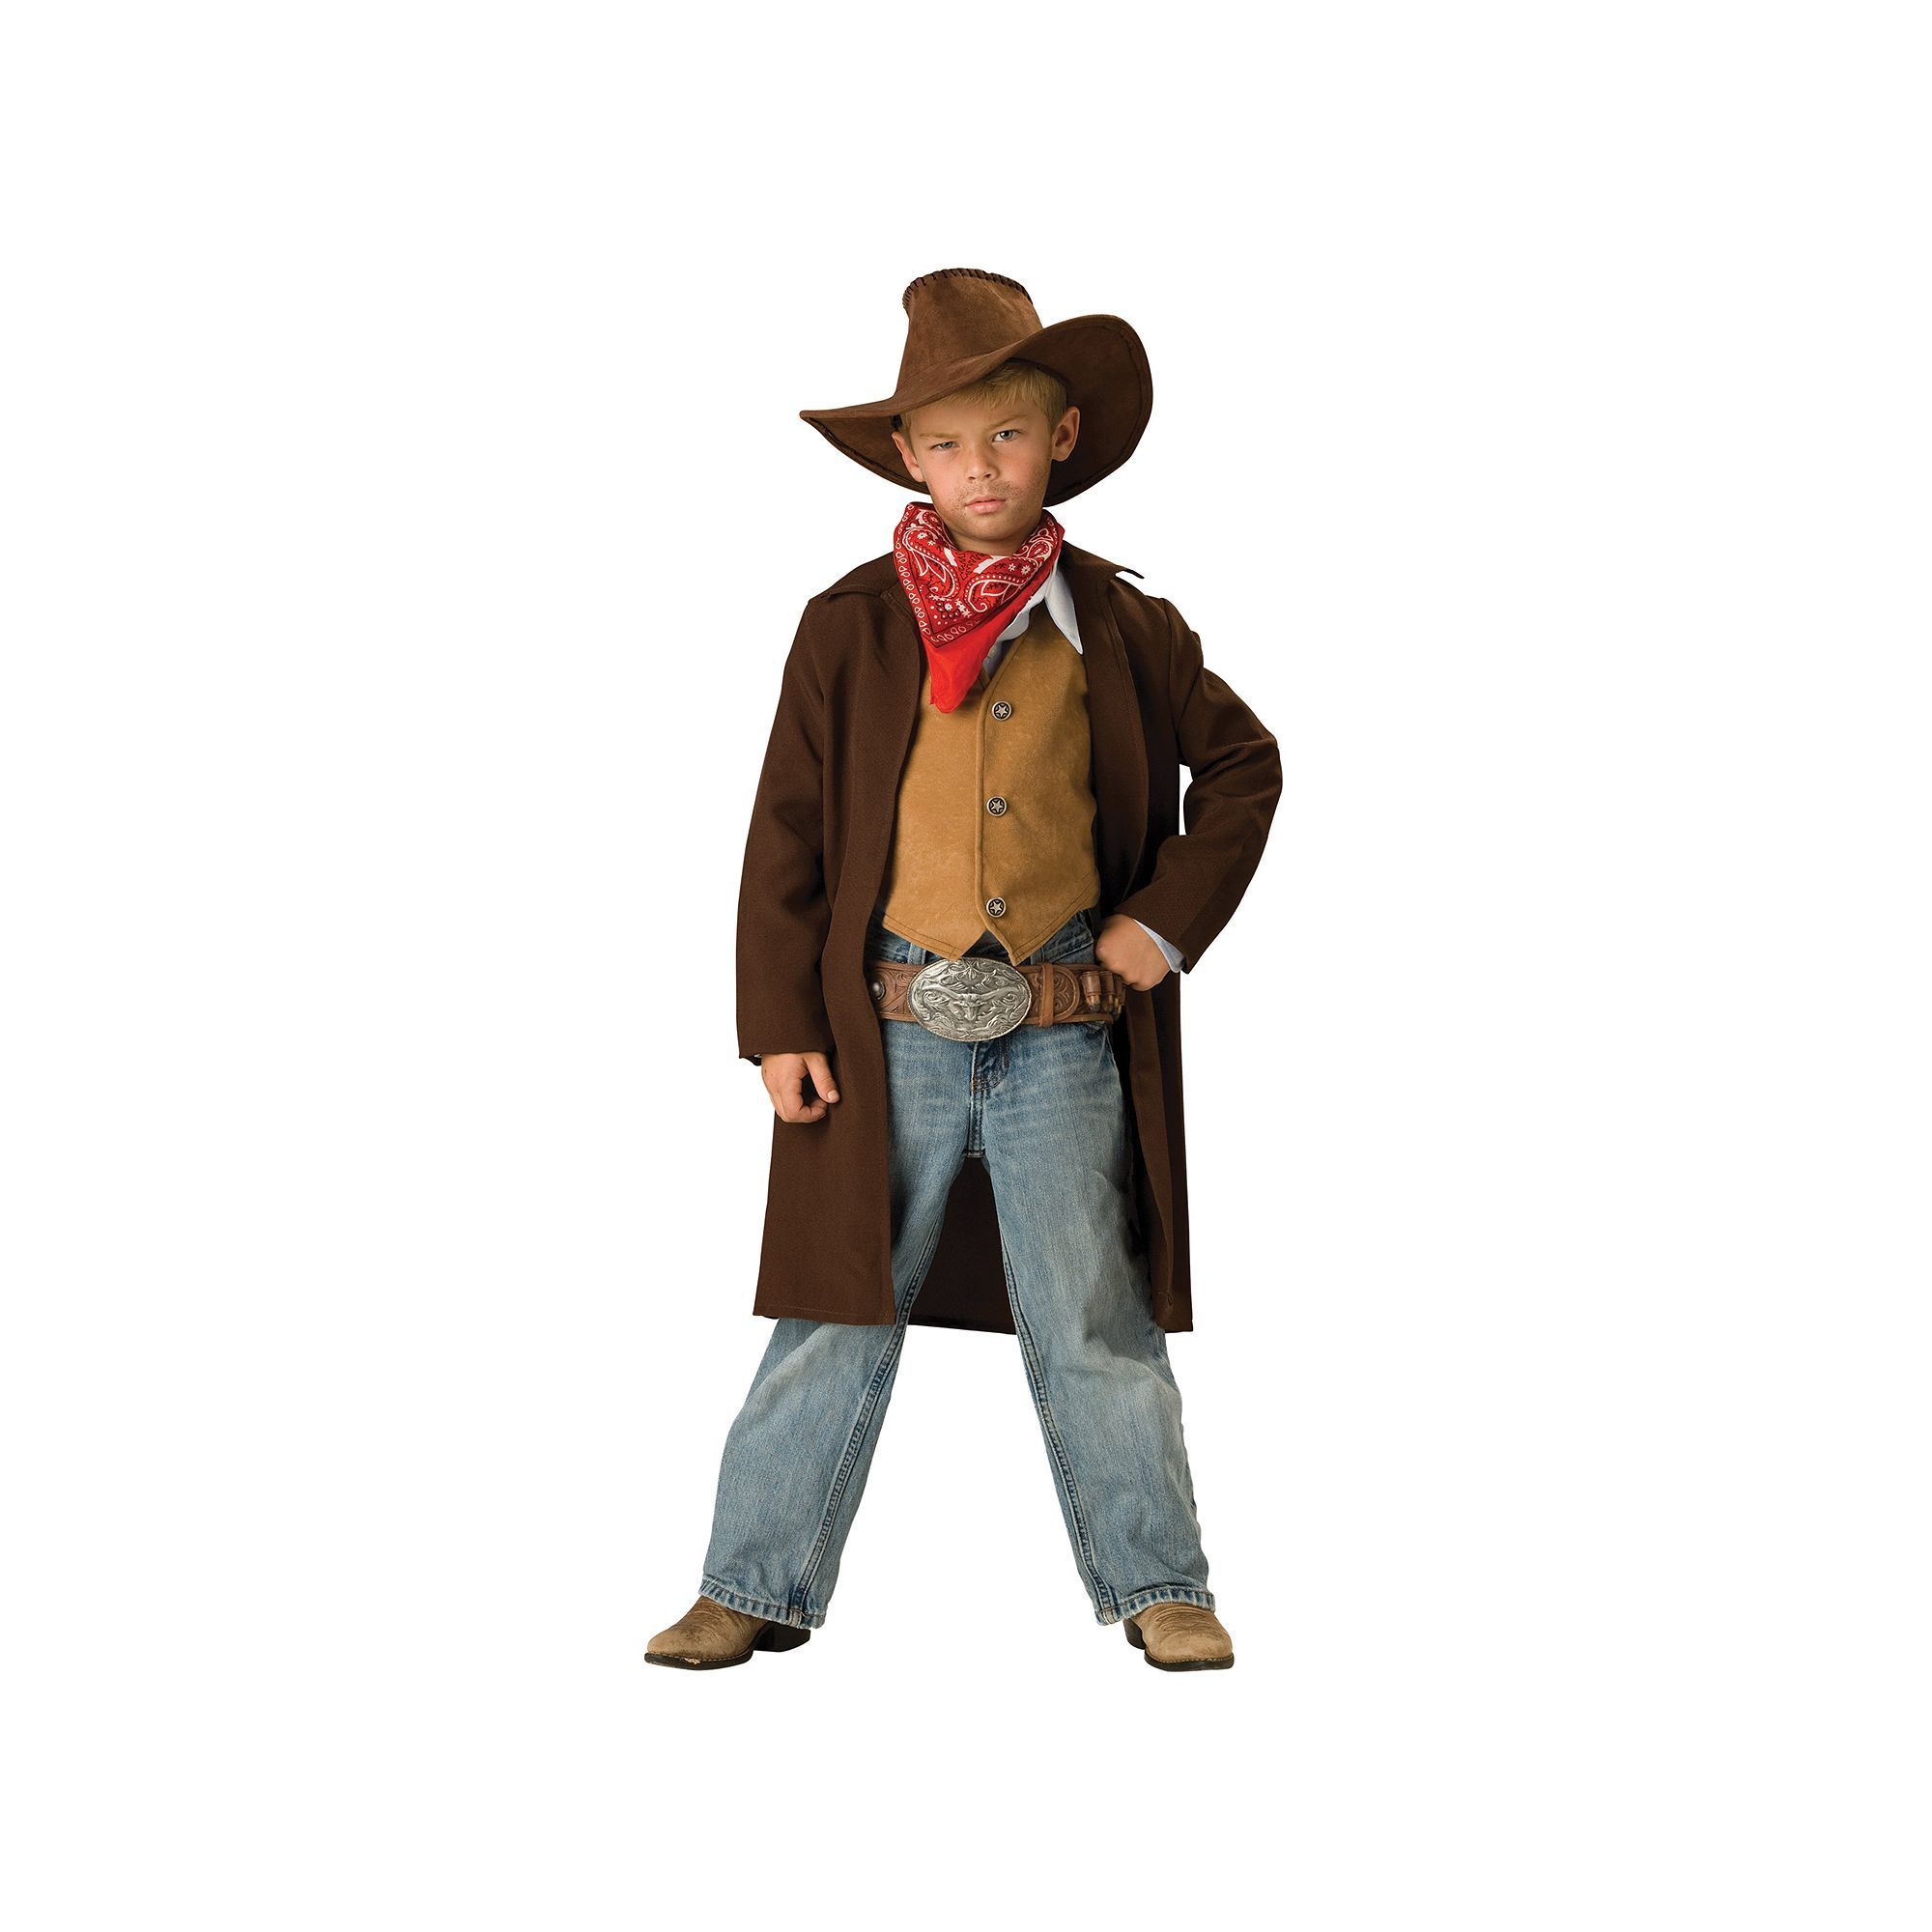 Plus Size Rawhide Renegade Costume - Kids Boyu0027s Size 10 Multicolor  sc 1 st  Pinterest & Plus Size Rawhide Renegade Costume - Kids Boyu0027s Size: 10 ...